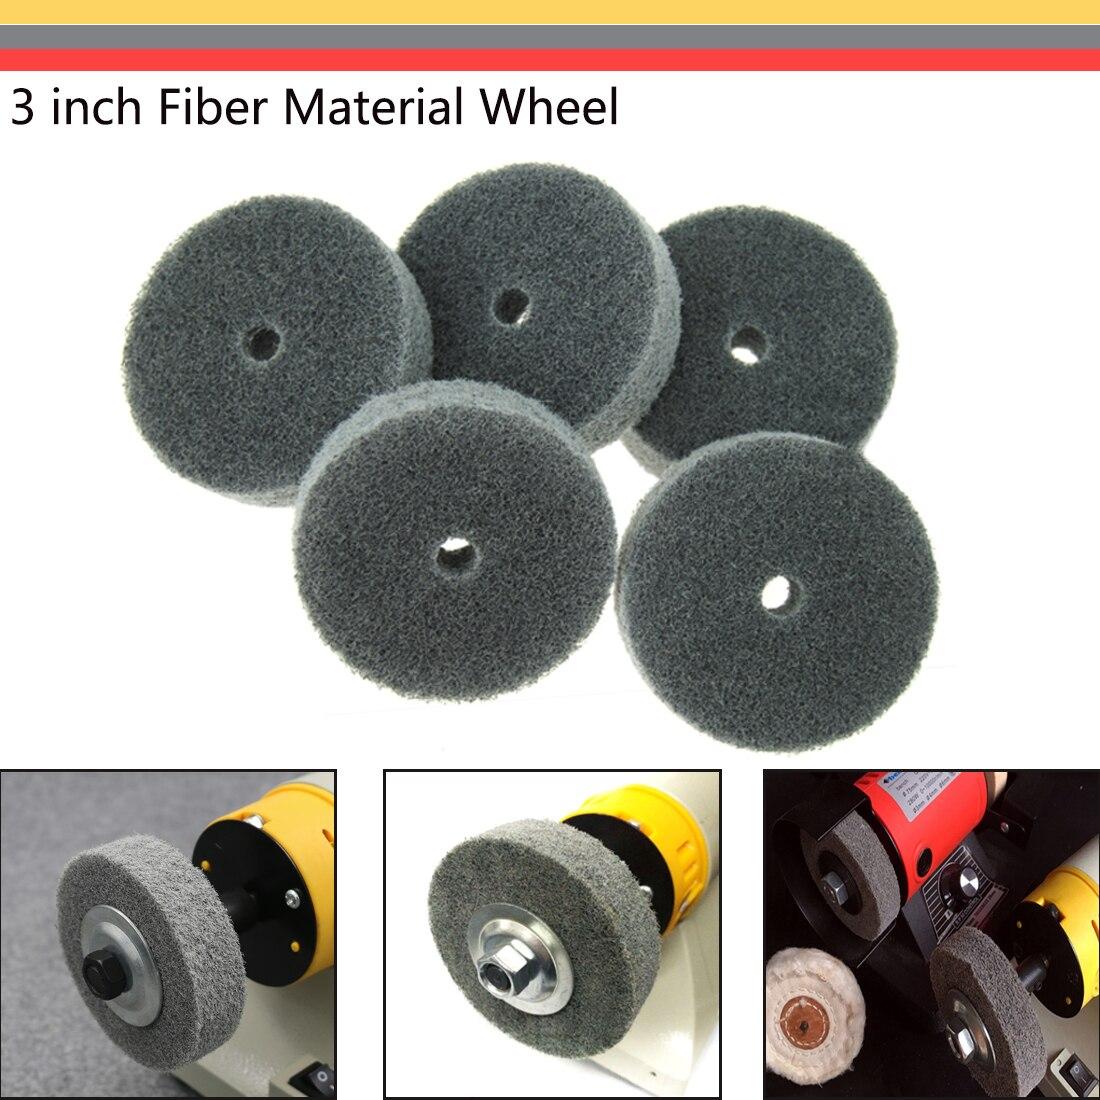 Instrument Grinding Iron Polishing Folding Knife Polishing Tool 75*19*10mm Nylon Wheel Fiber Wheel Durable Selected Products